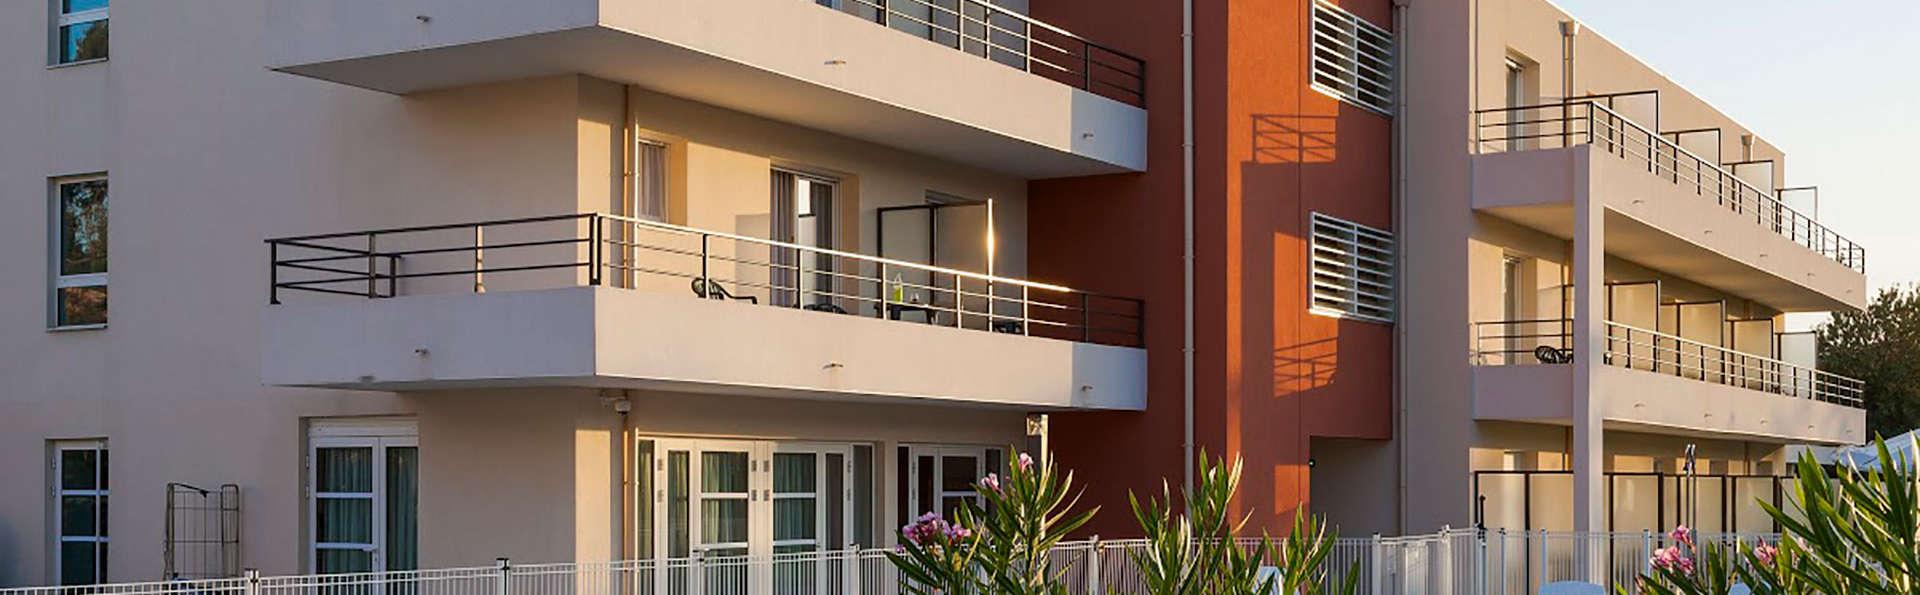 Comfort Suites Cannes-Mandelieu - EDIT_front.jpg